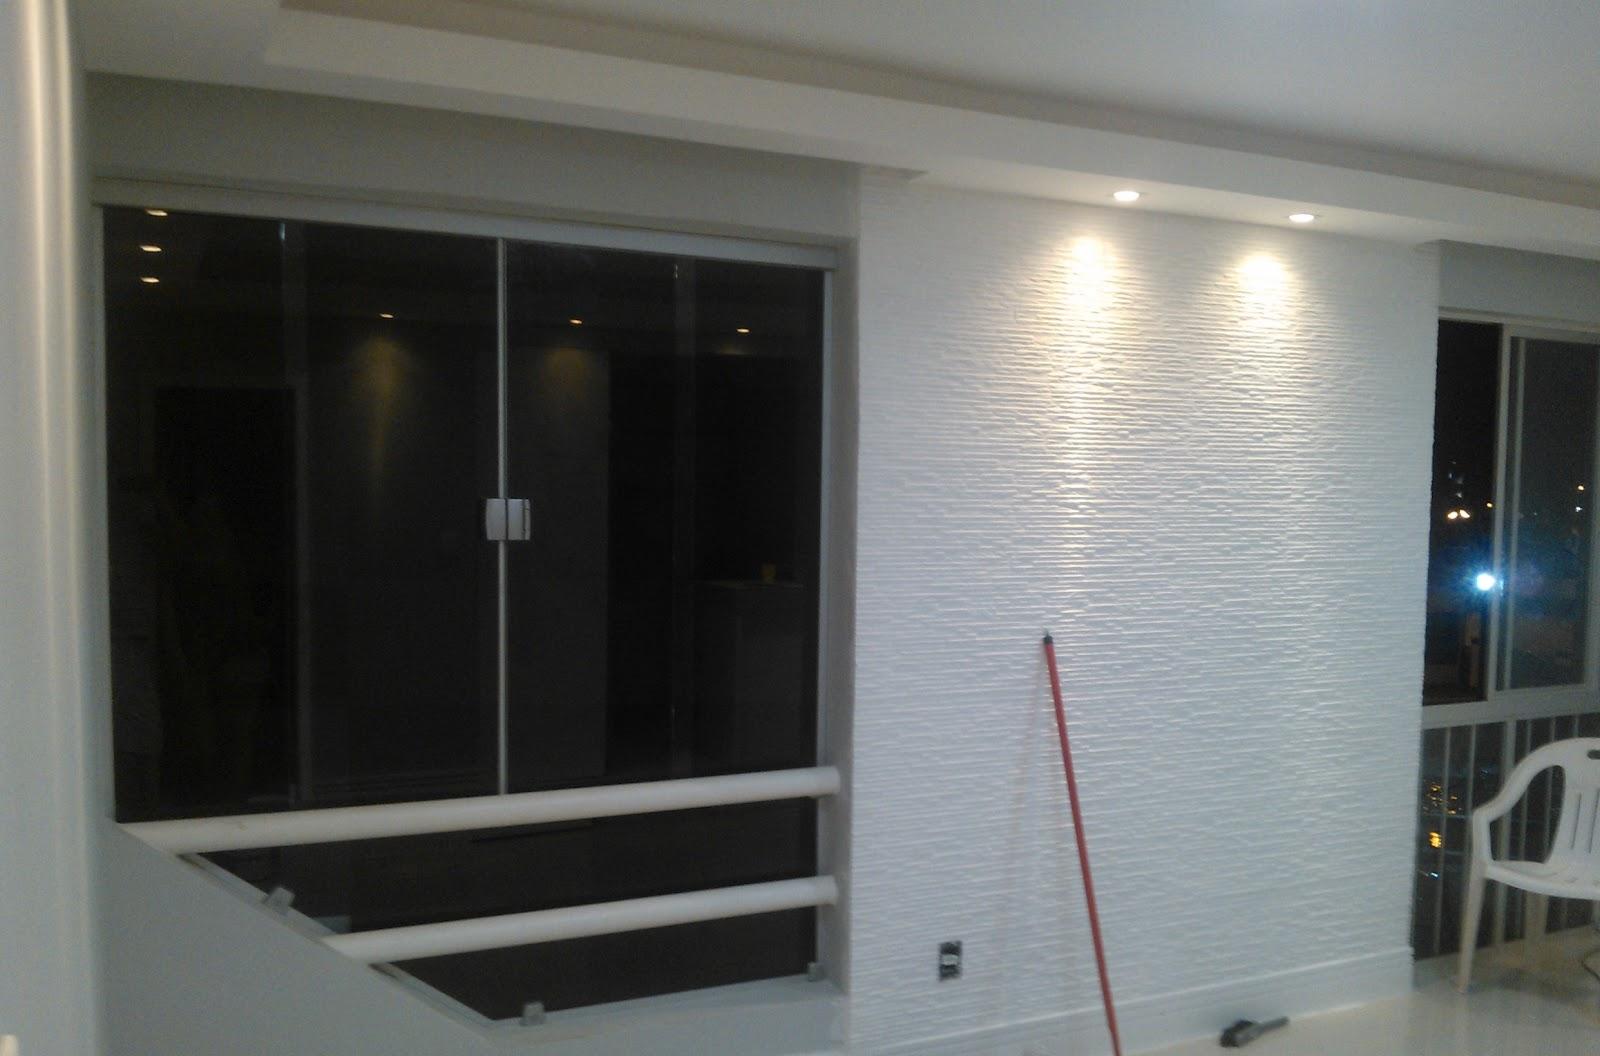 #756B56 Nosso 1º apê: Finalmente minha janela ficou pronta 158 Janelas De Vidro Joinville